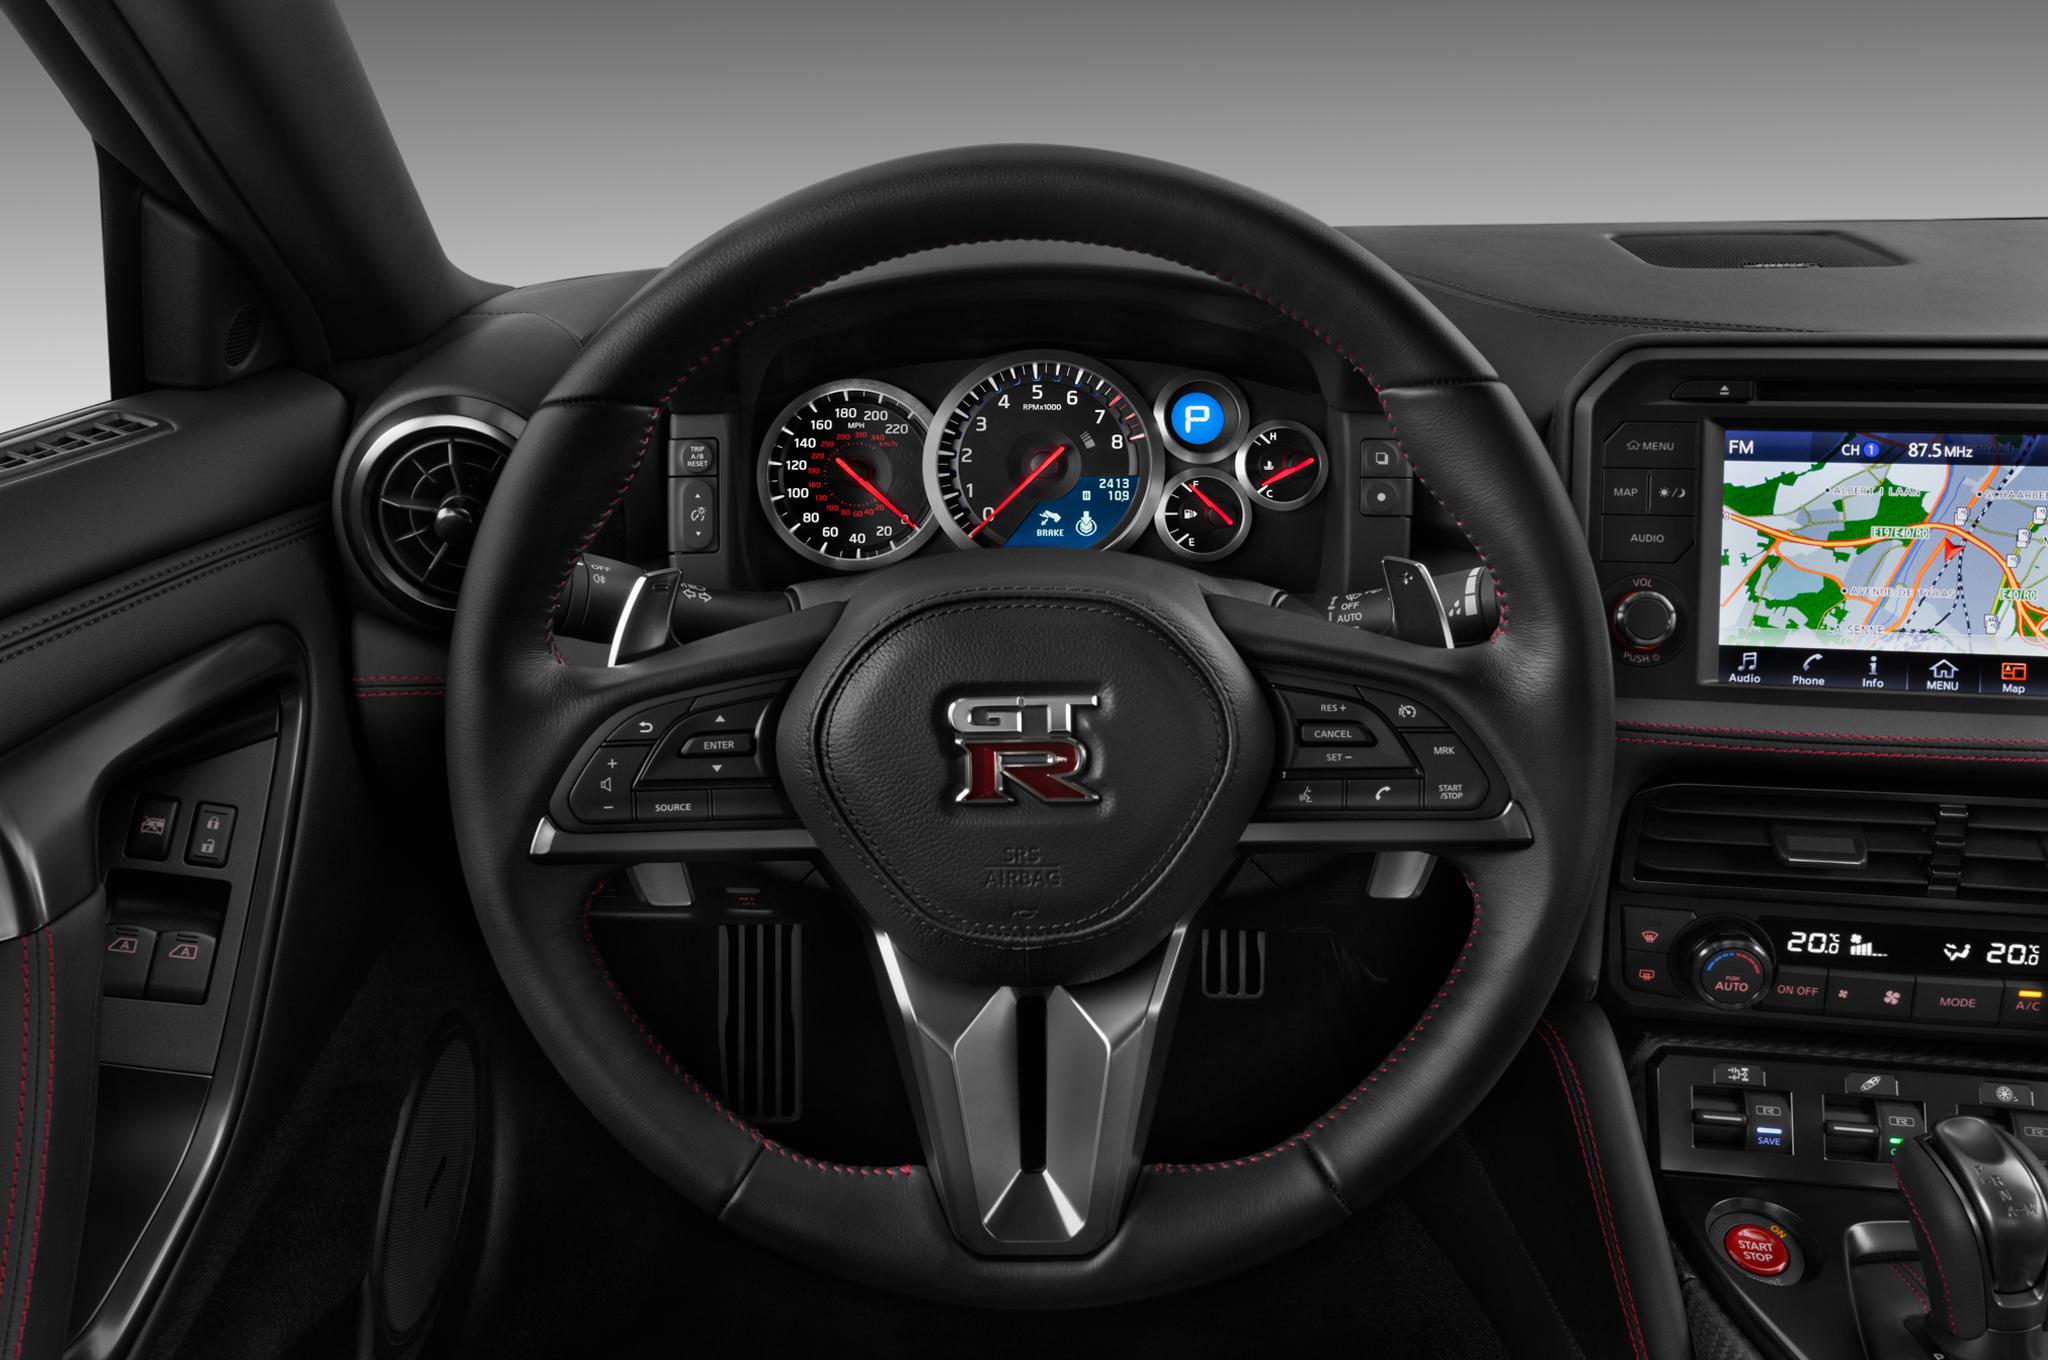 2018 Nissan Gt R Quick Take Review Automobile Magazine